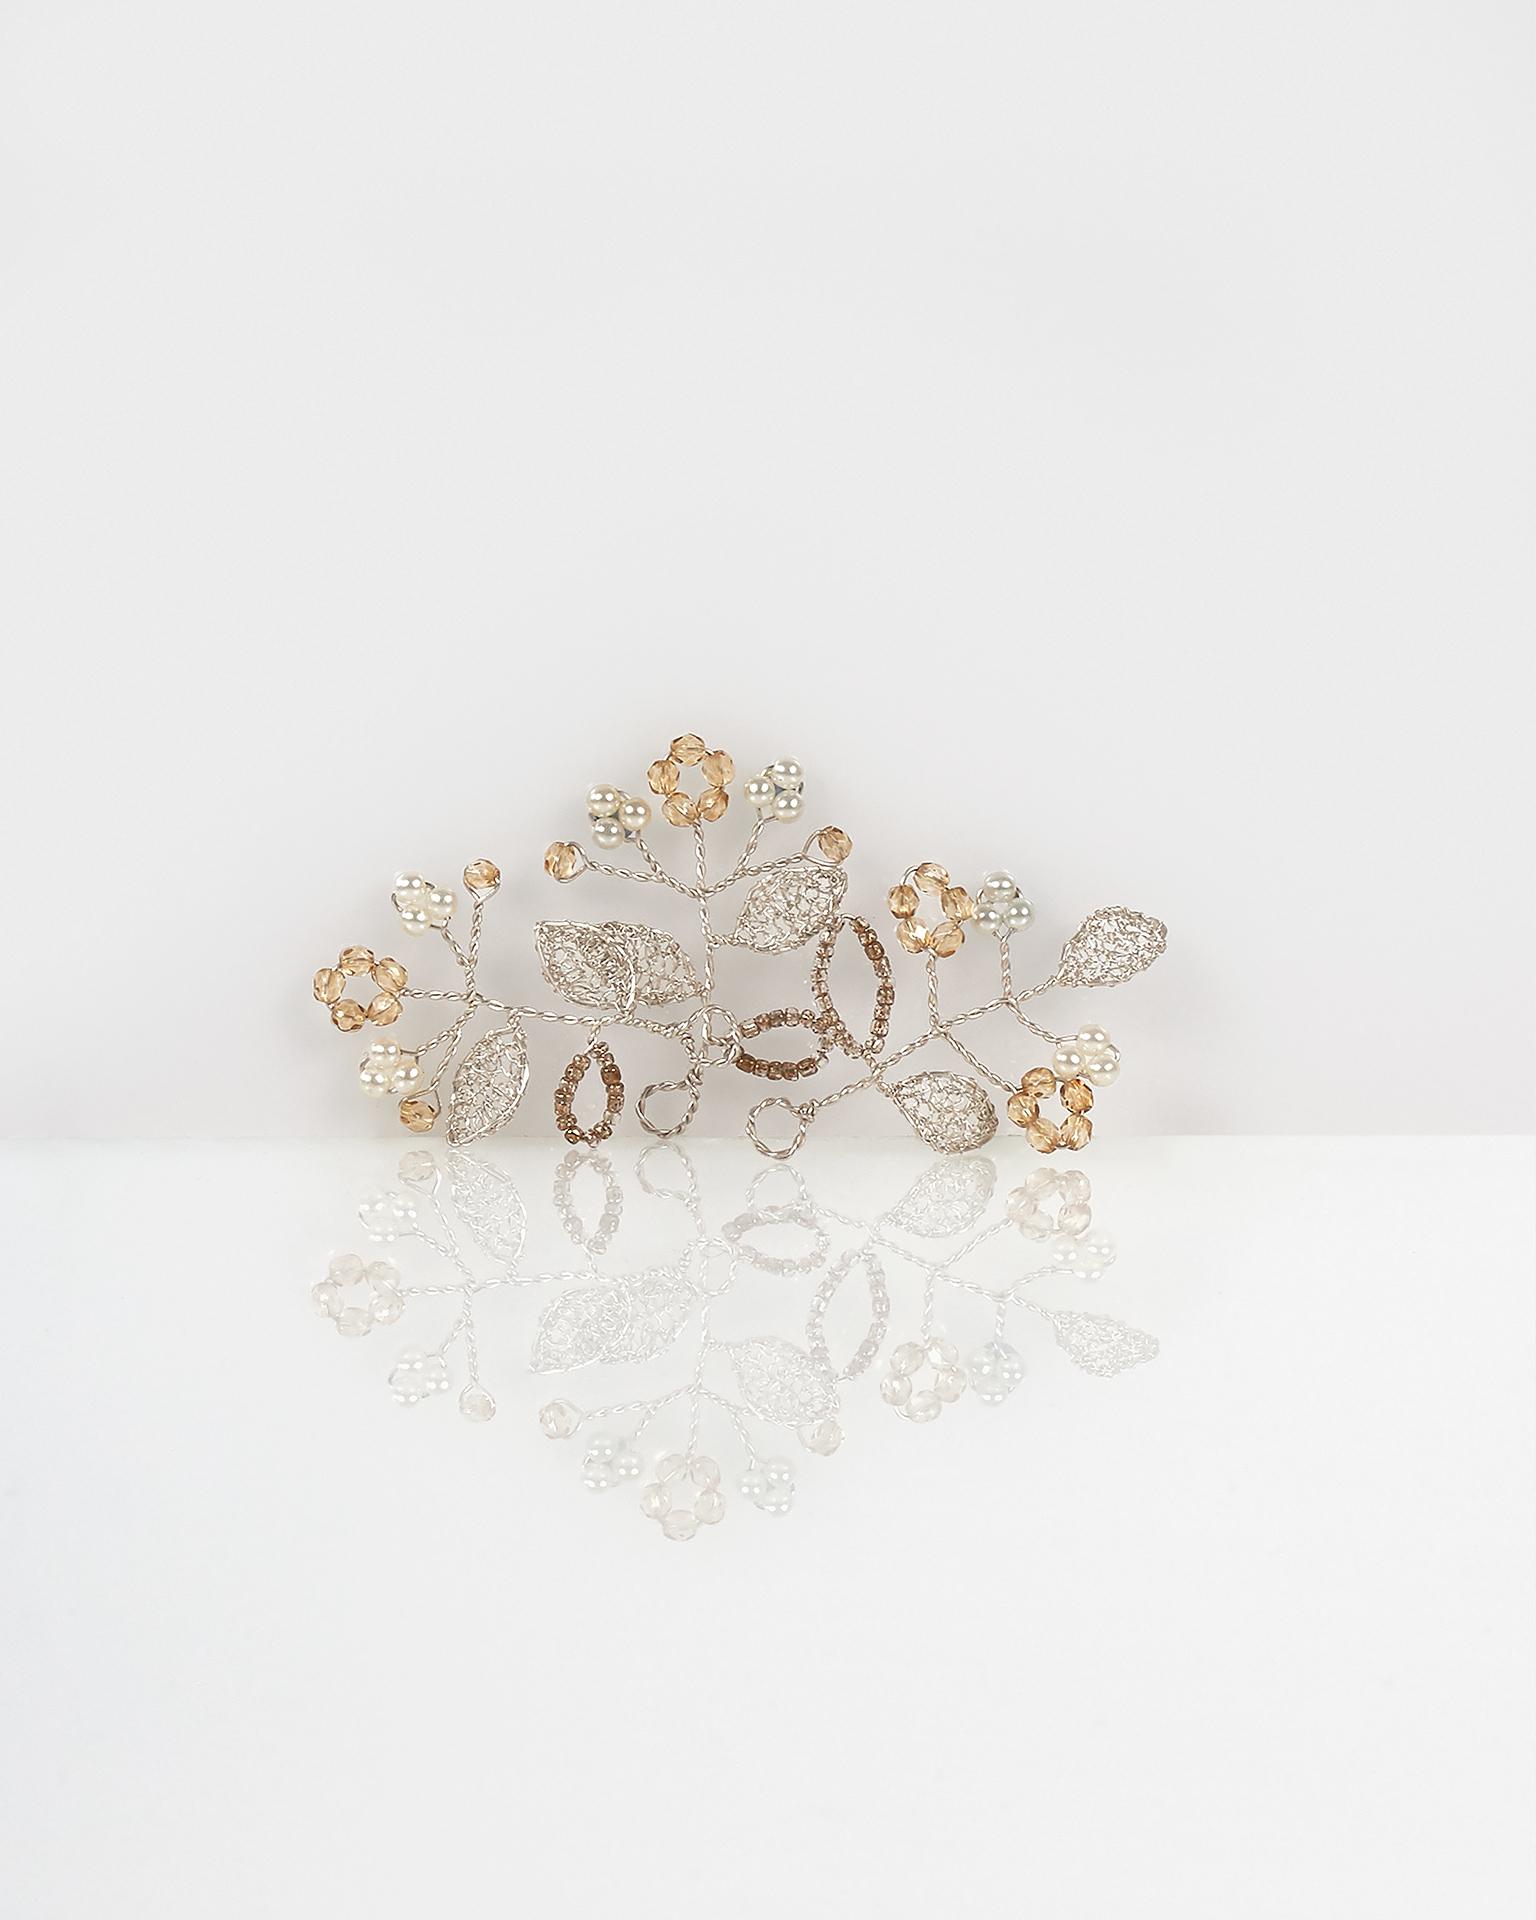 Lucia银色宝石镶饰银丝头饰发卡(3件装)。 AIRE BARCELONA 新品系列 2018.